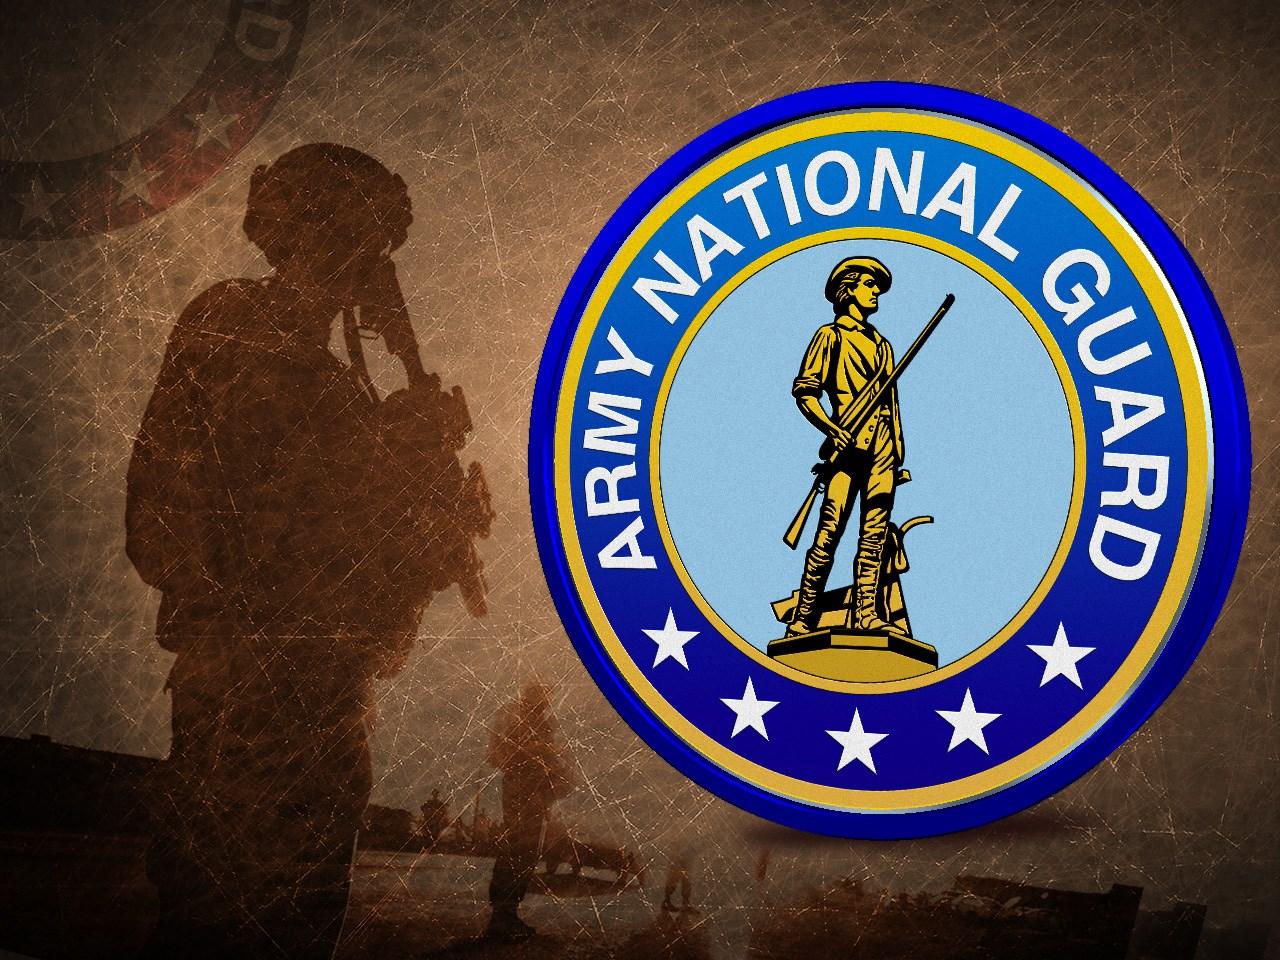 National Guard.jpg